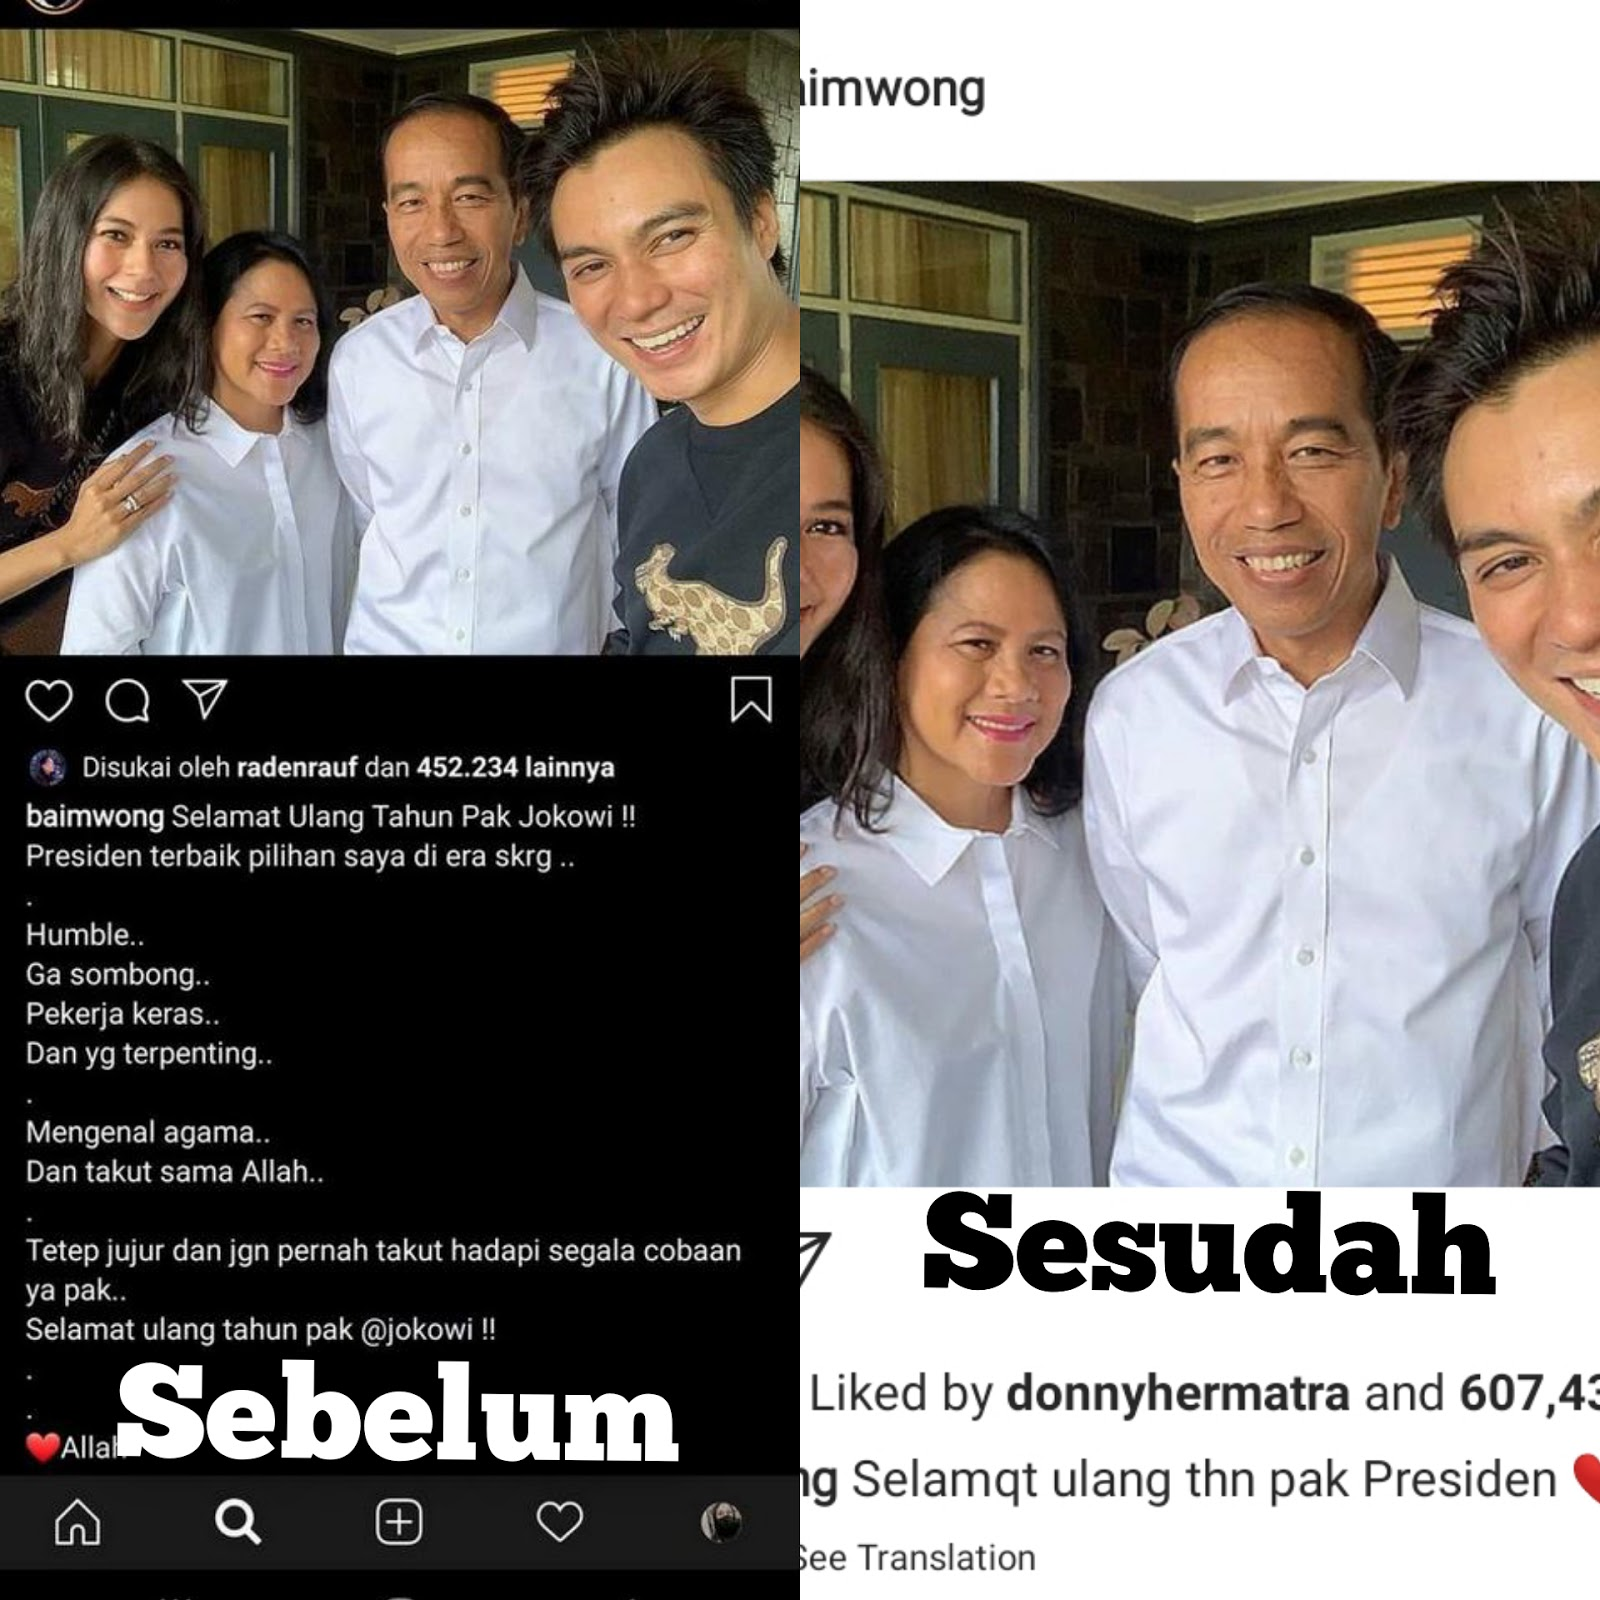 Kapok, Baim Wong Hapus Pujian ke Jokowi dan Ngunci Kolom Komentar